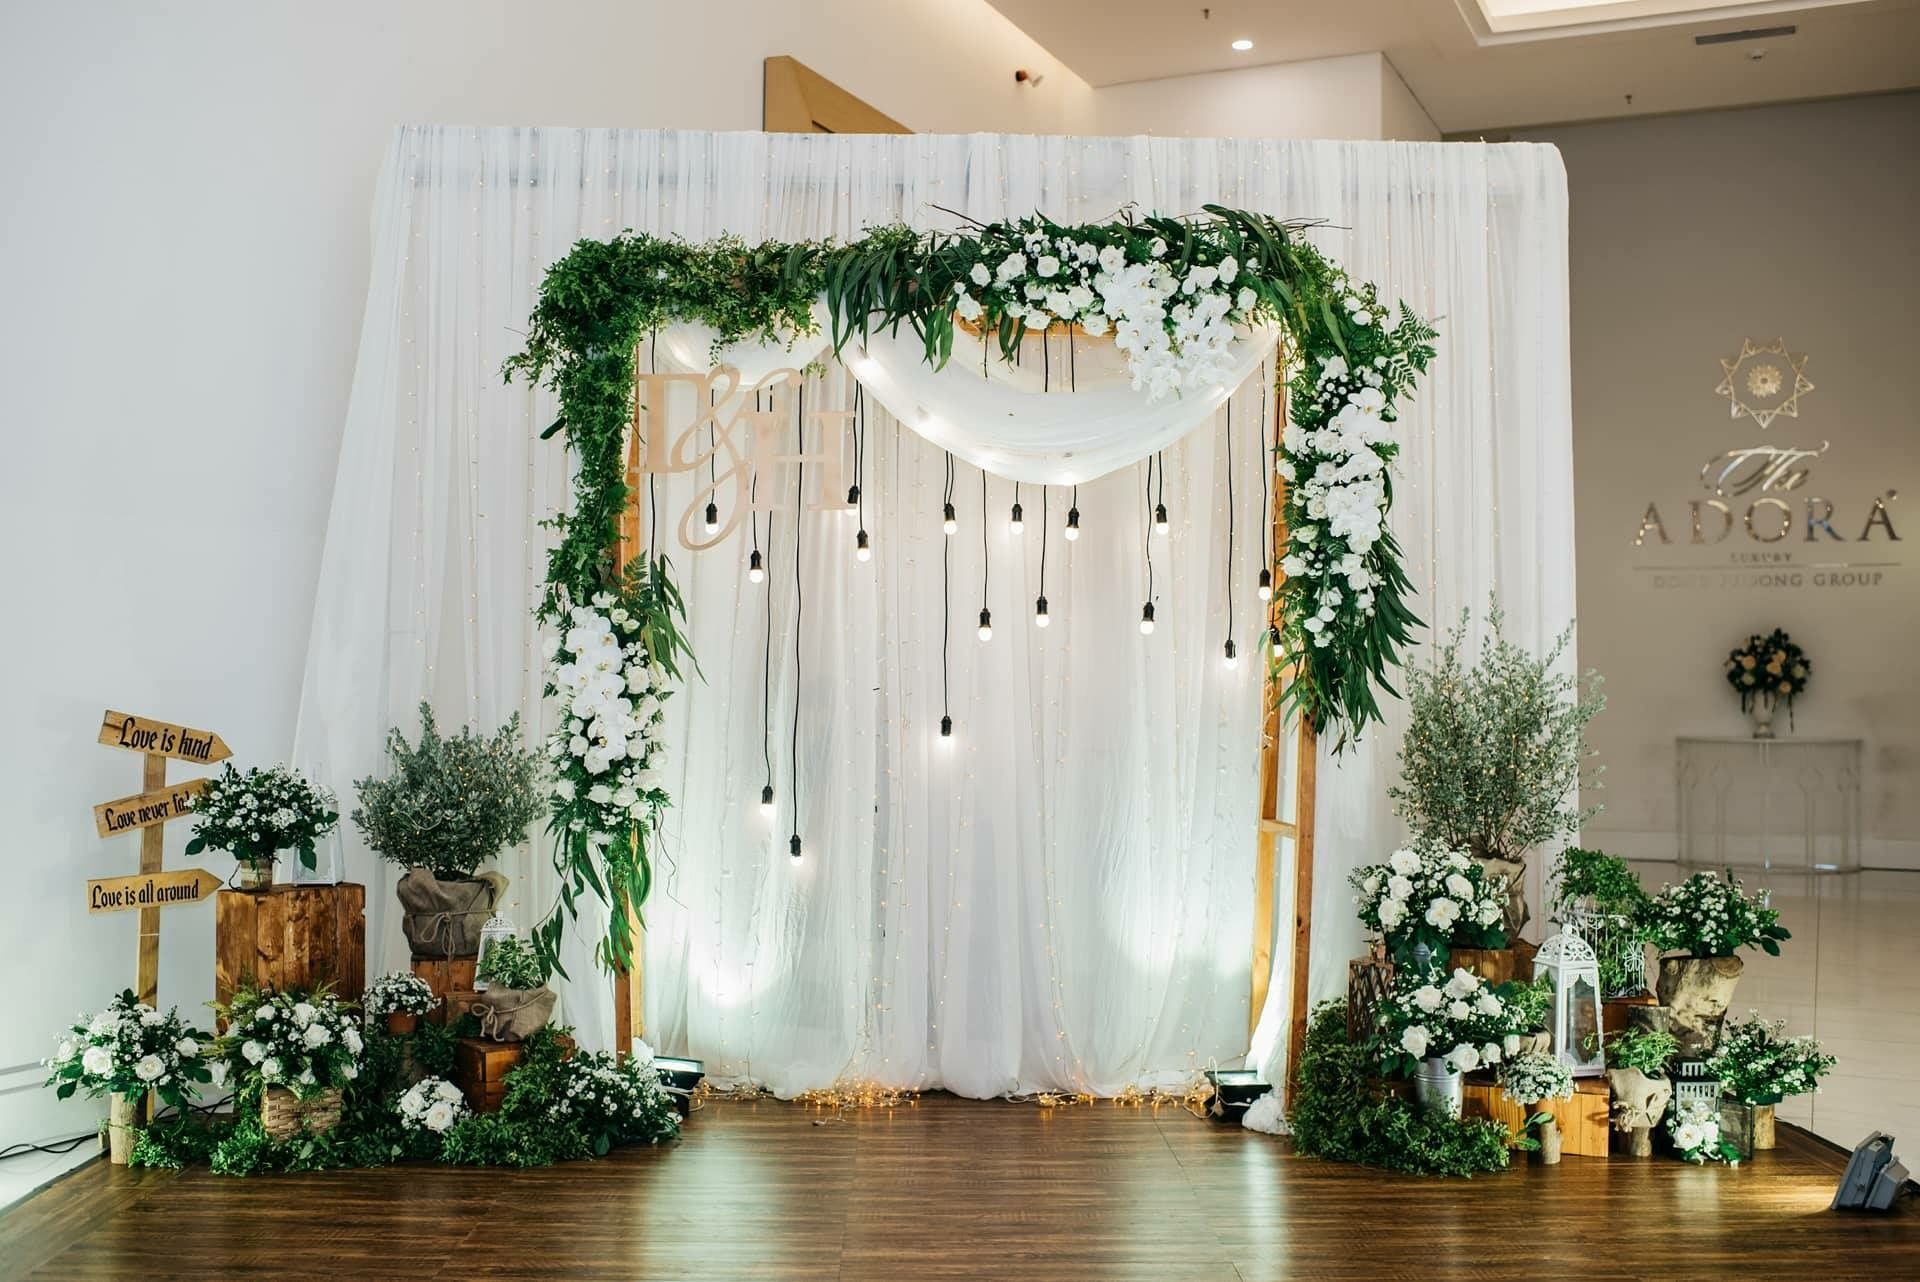 Pin by Quynhu Nguyen on Wedding Backdrop | Pinterest ...